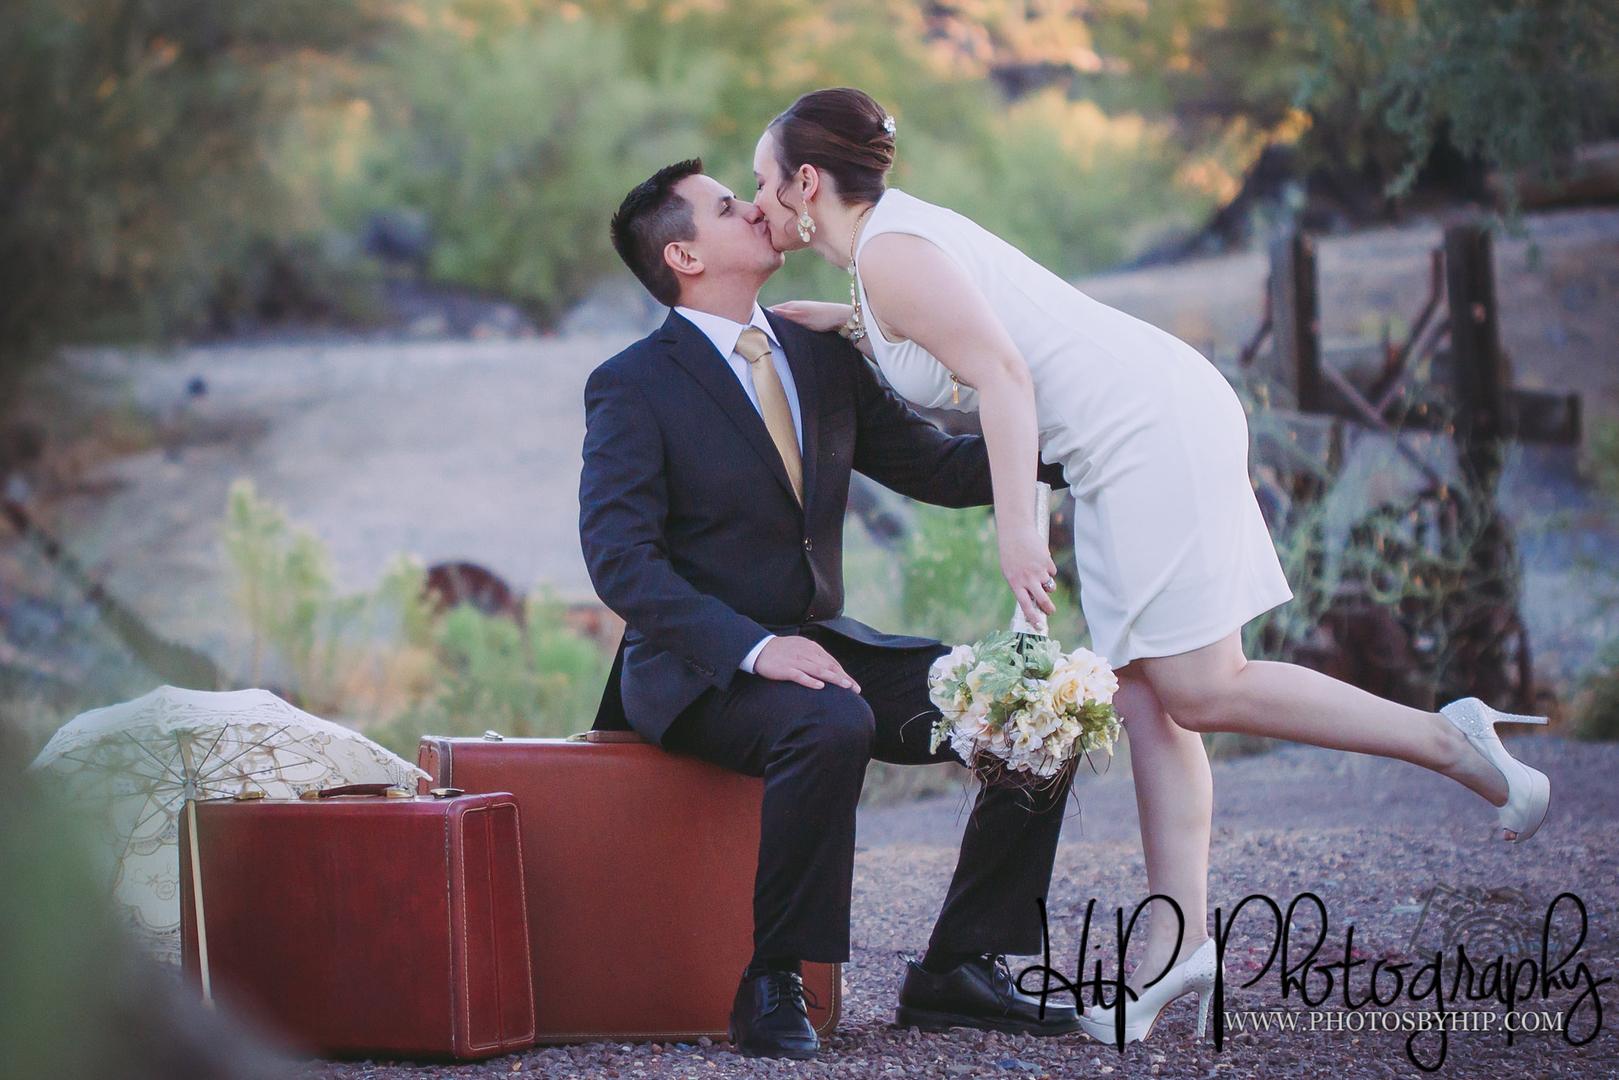 The Best Wedding Chapel In Arizona